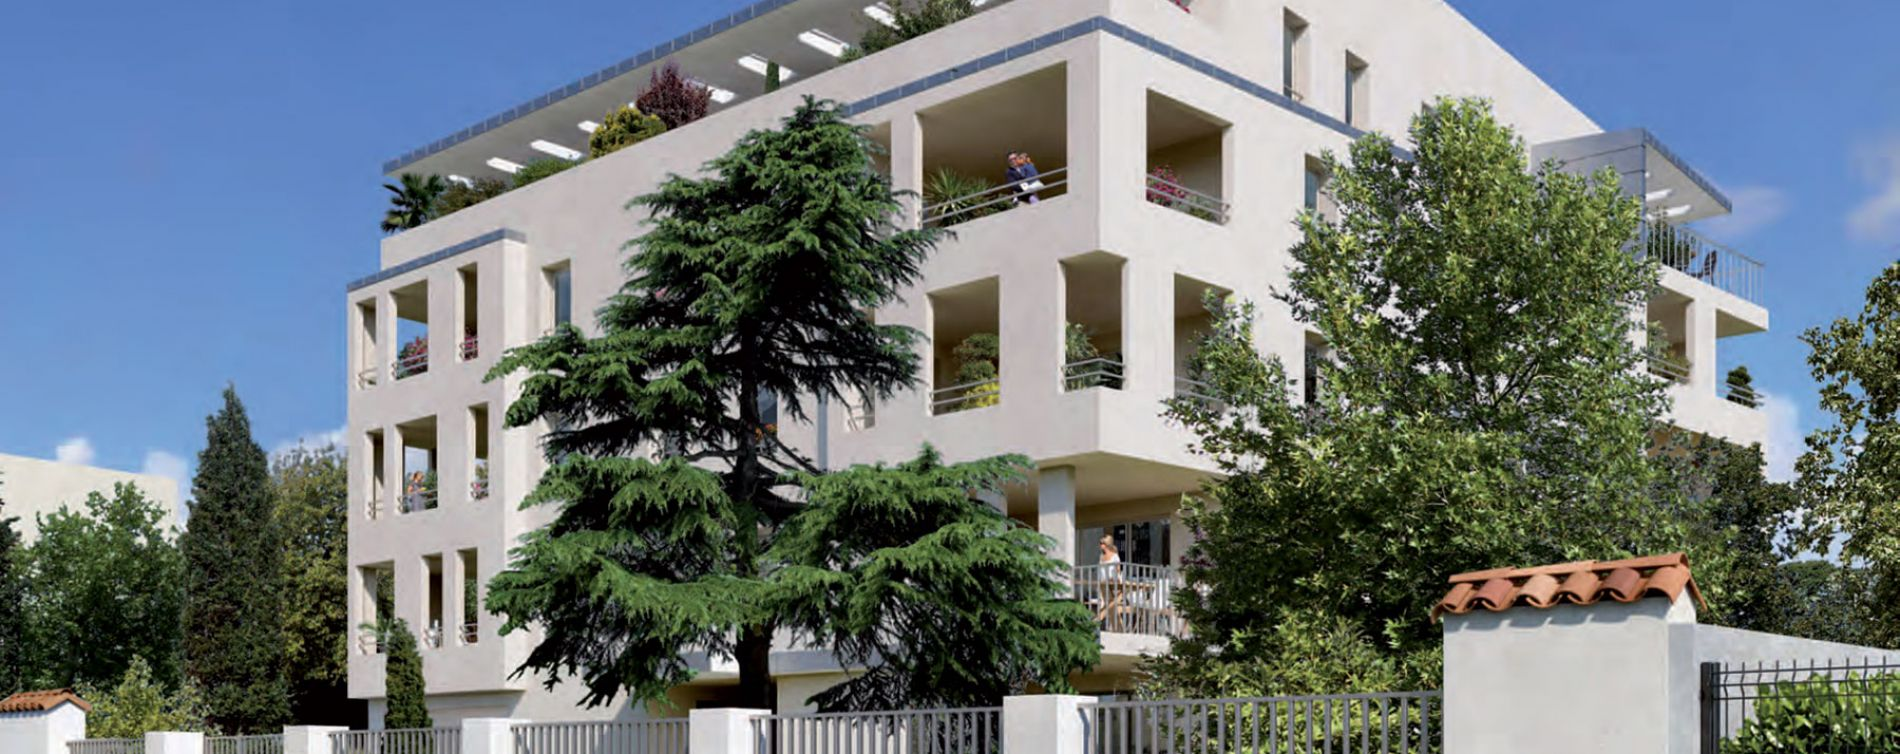 Résidence Isadora à Marseille